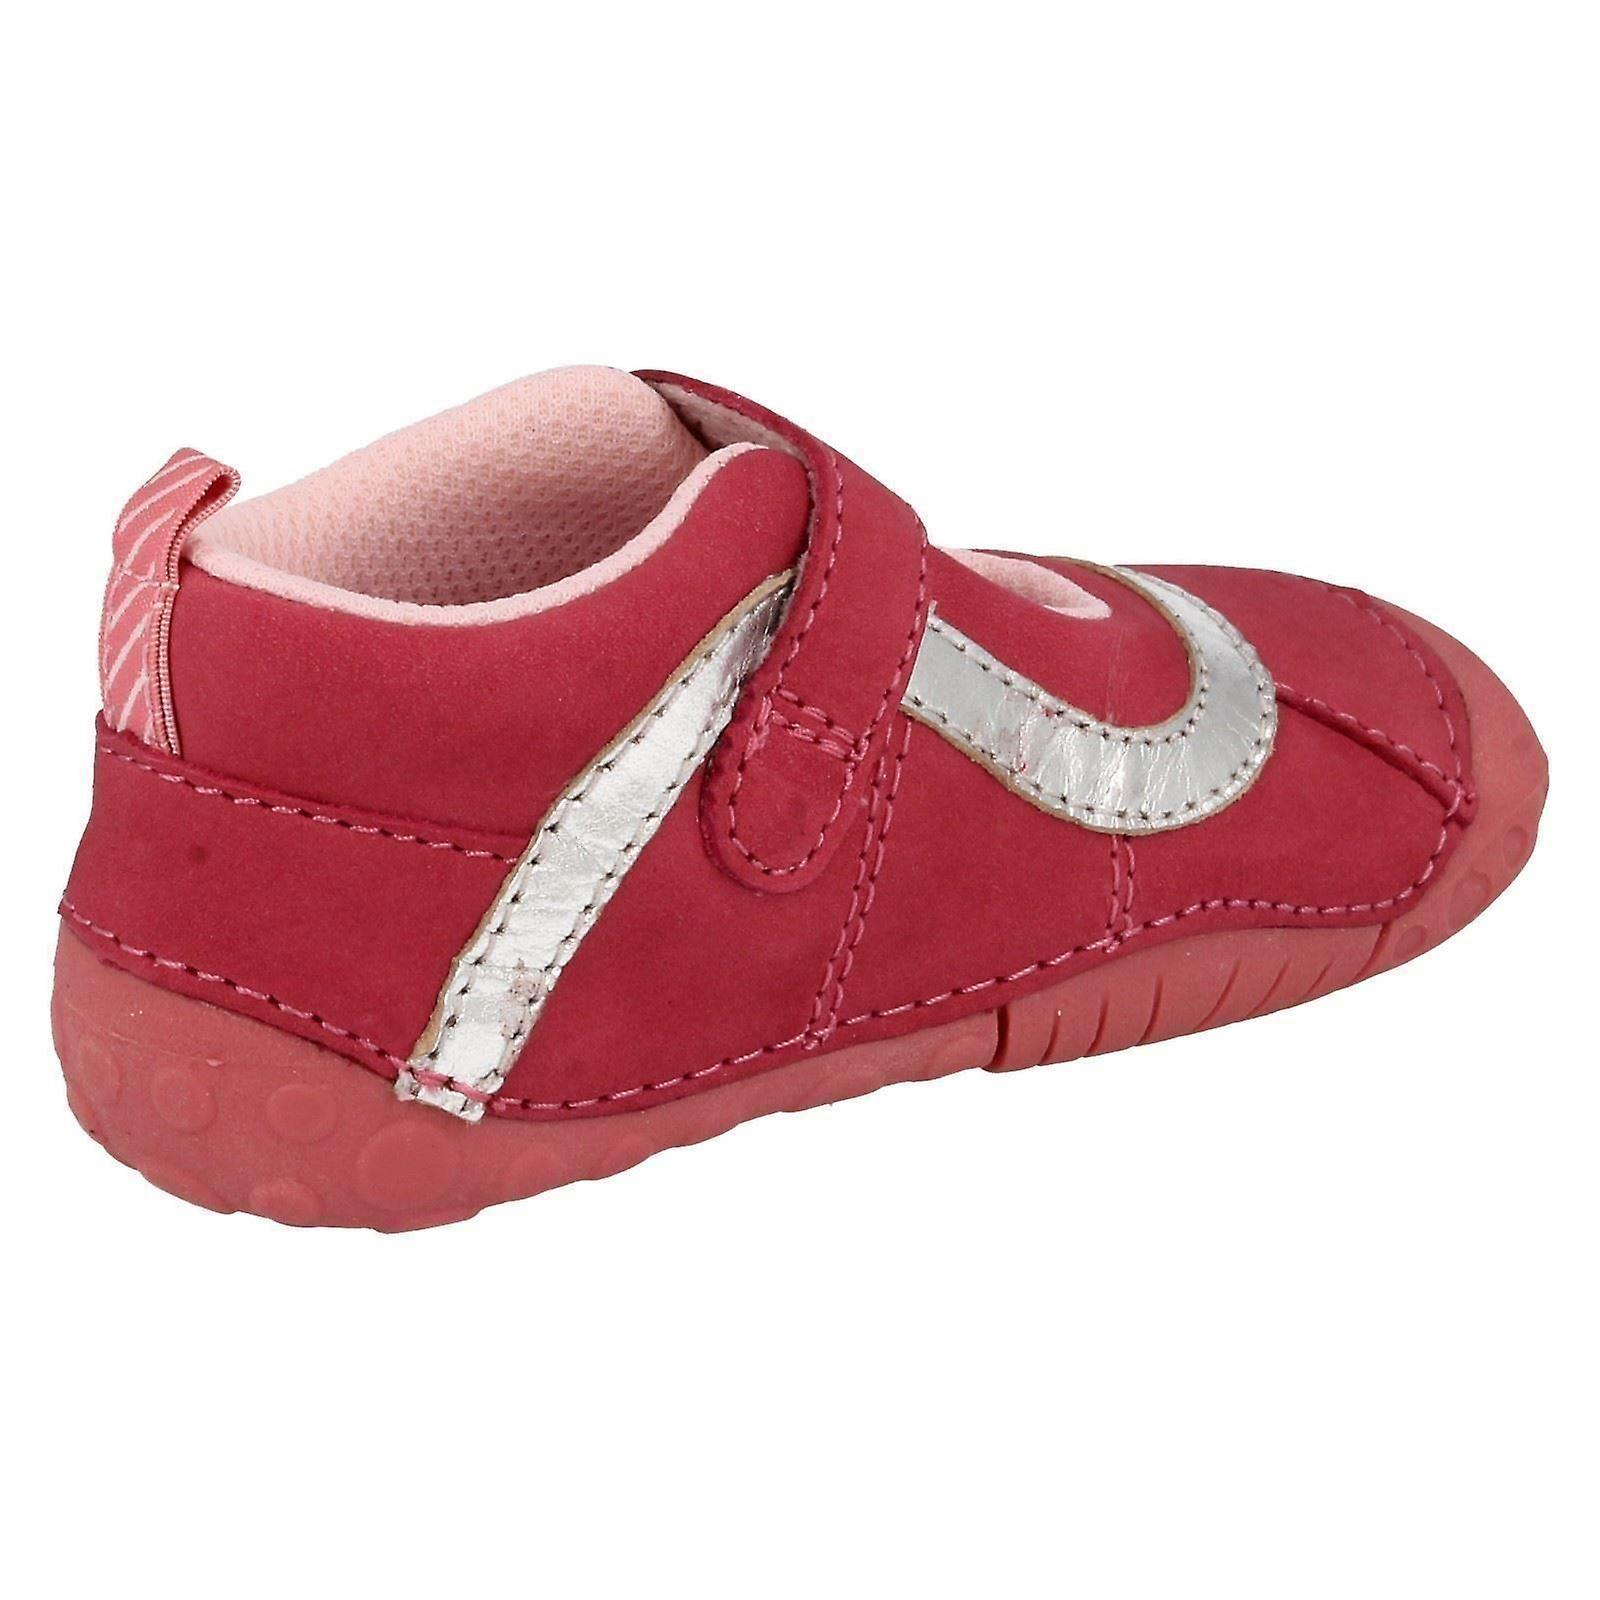 Girls Girls Girls Startrite Pre Walker Shoes Bright a57644